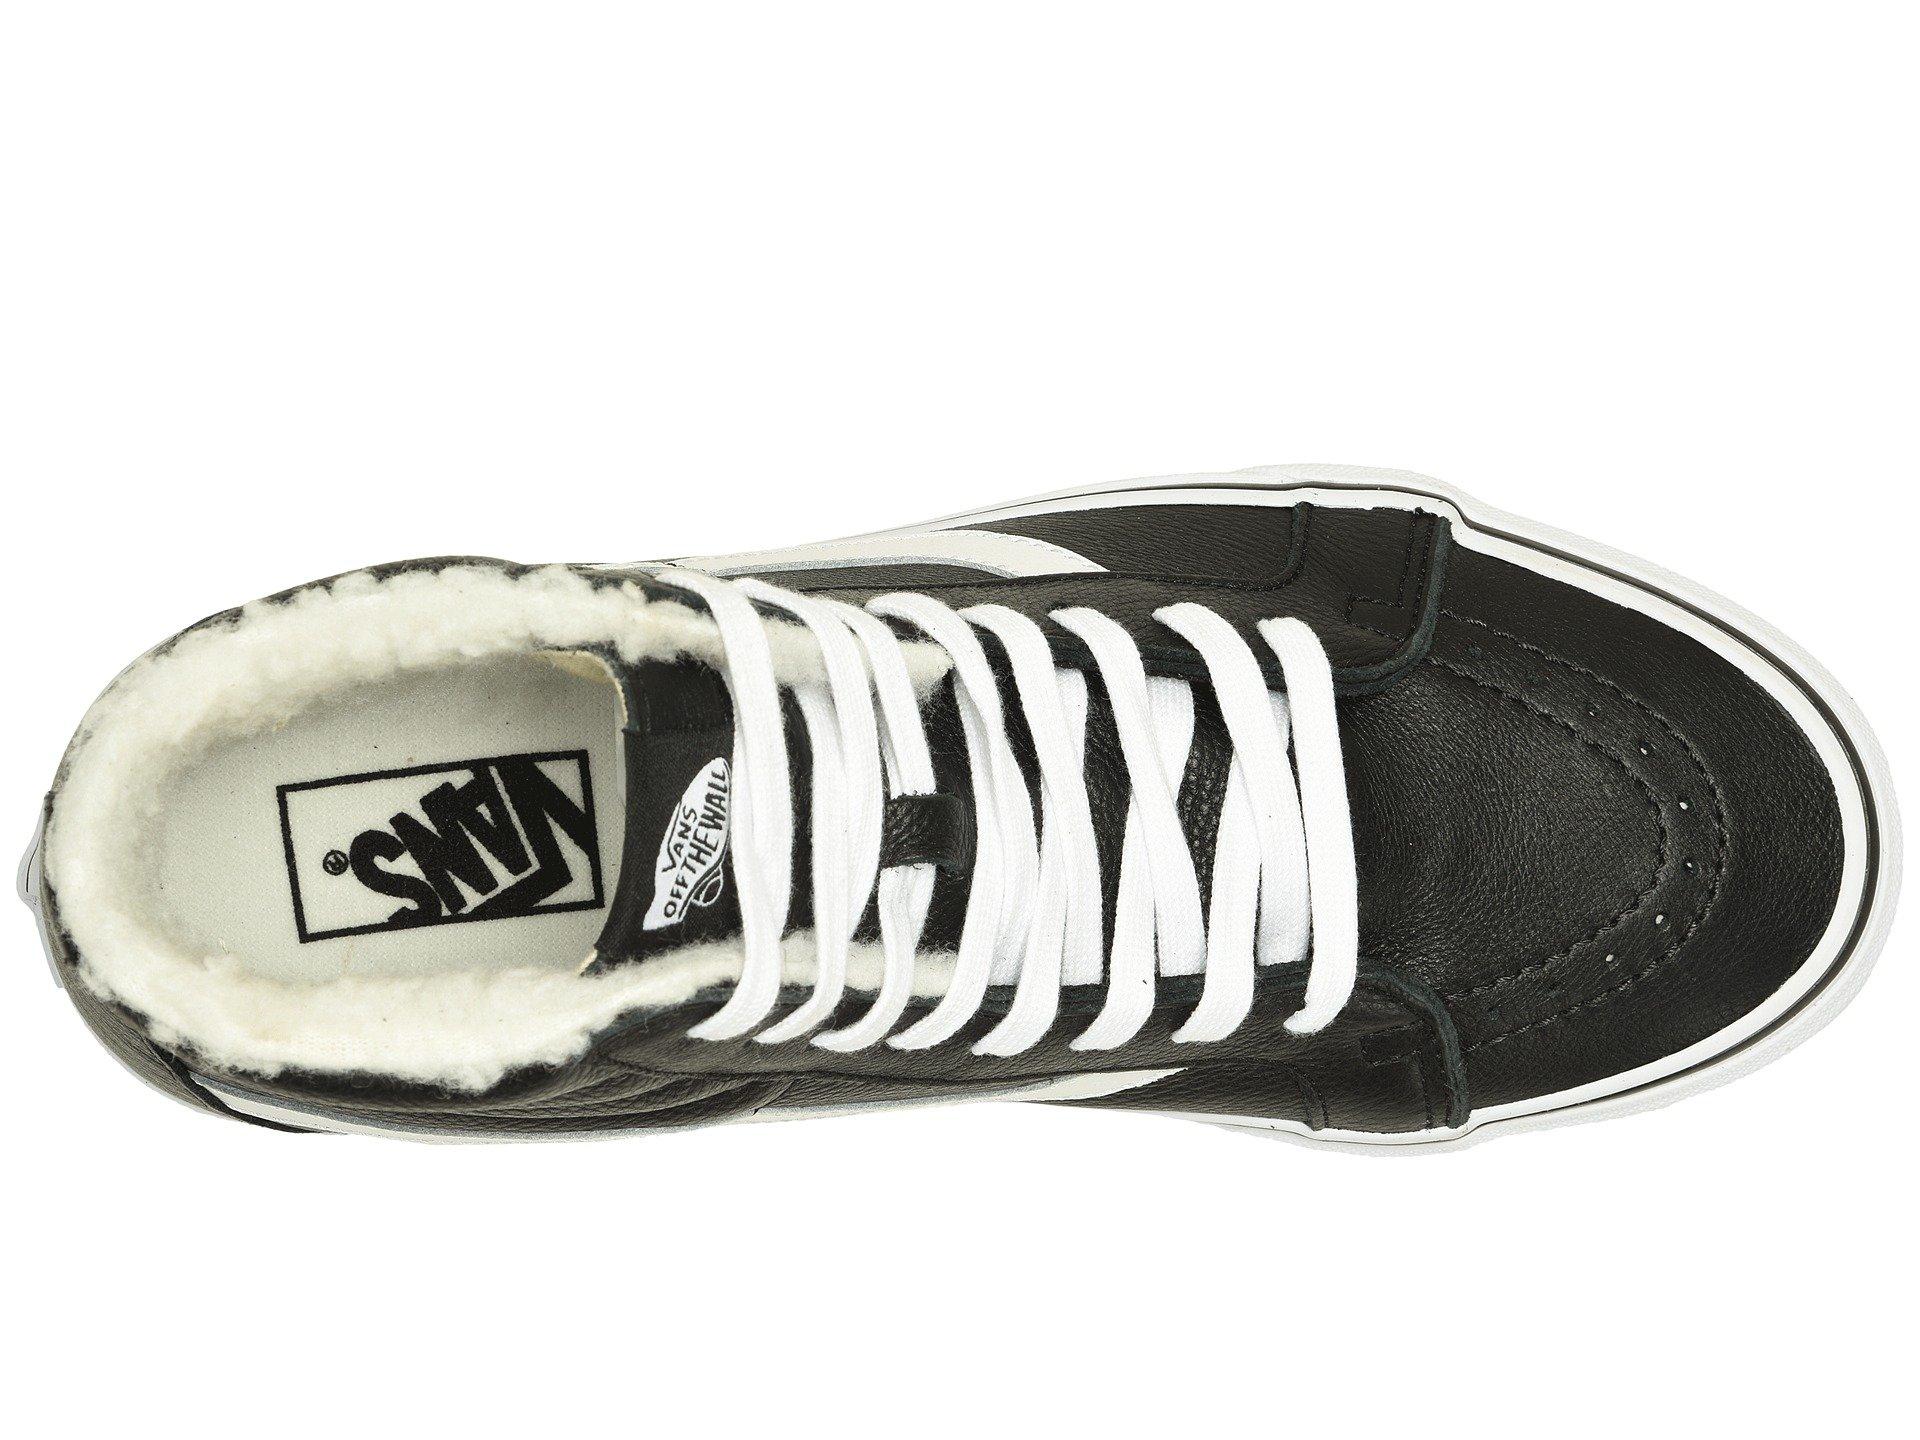 leather Black White Reissue fleece hi 2 Vans true Sk8 7WxnTCf70t